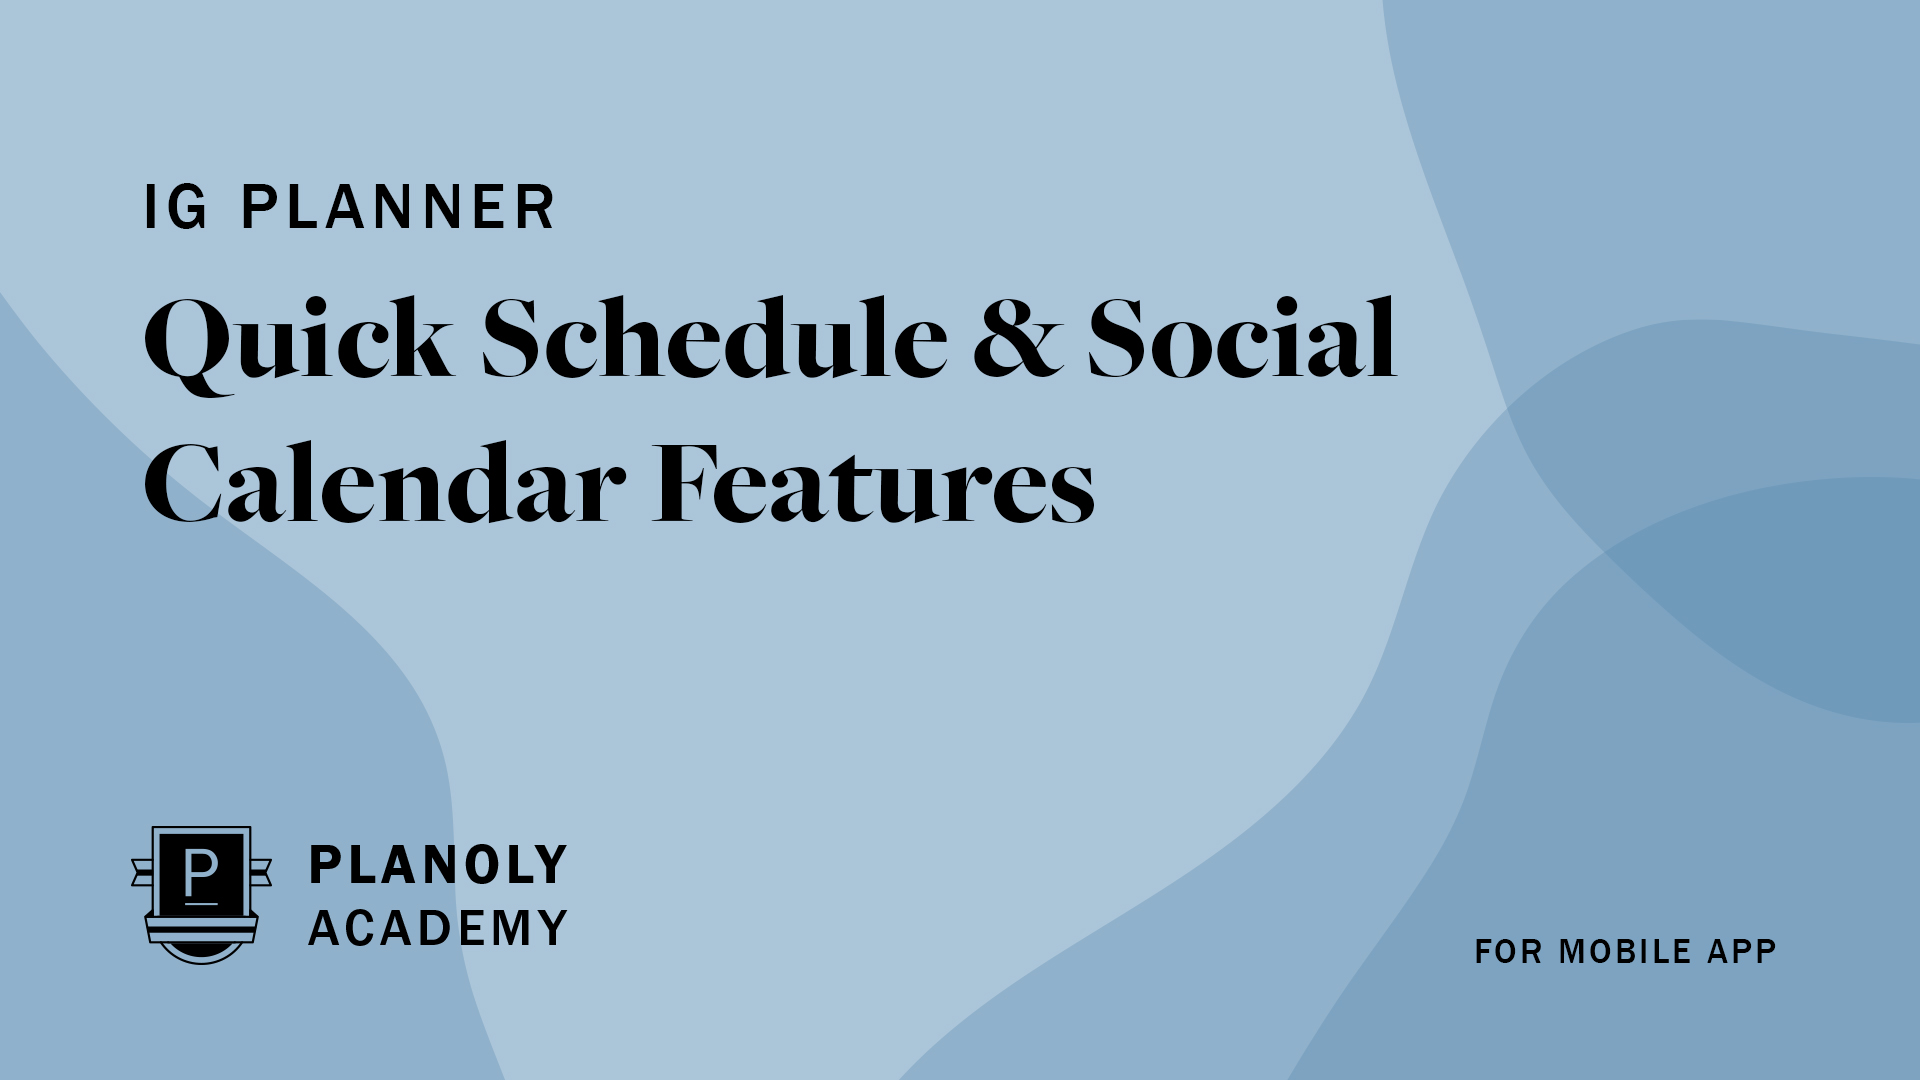 Quick Schedule & Social Calendar